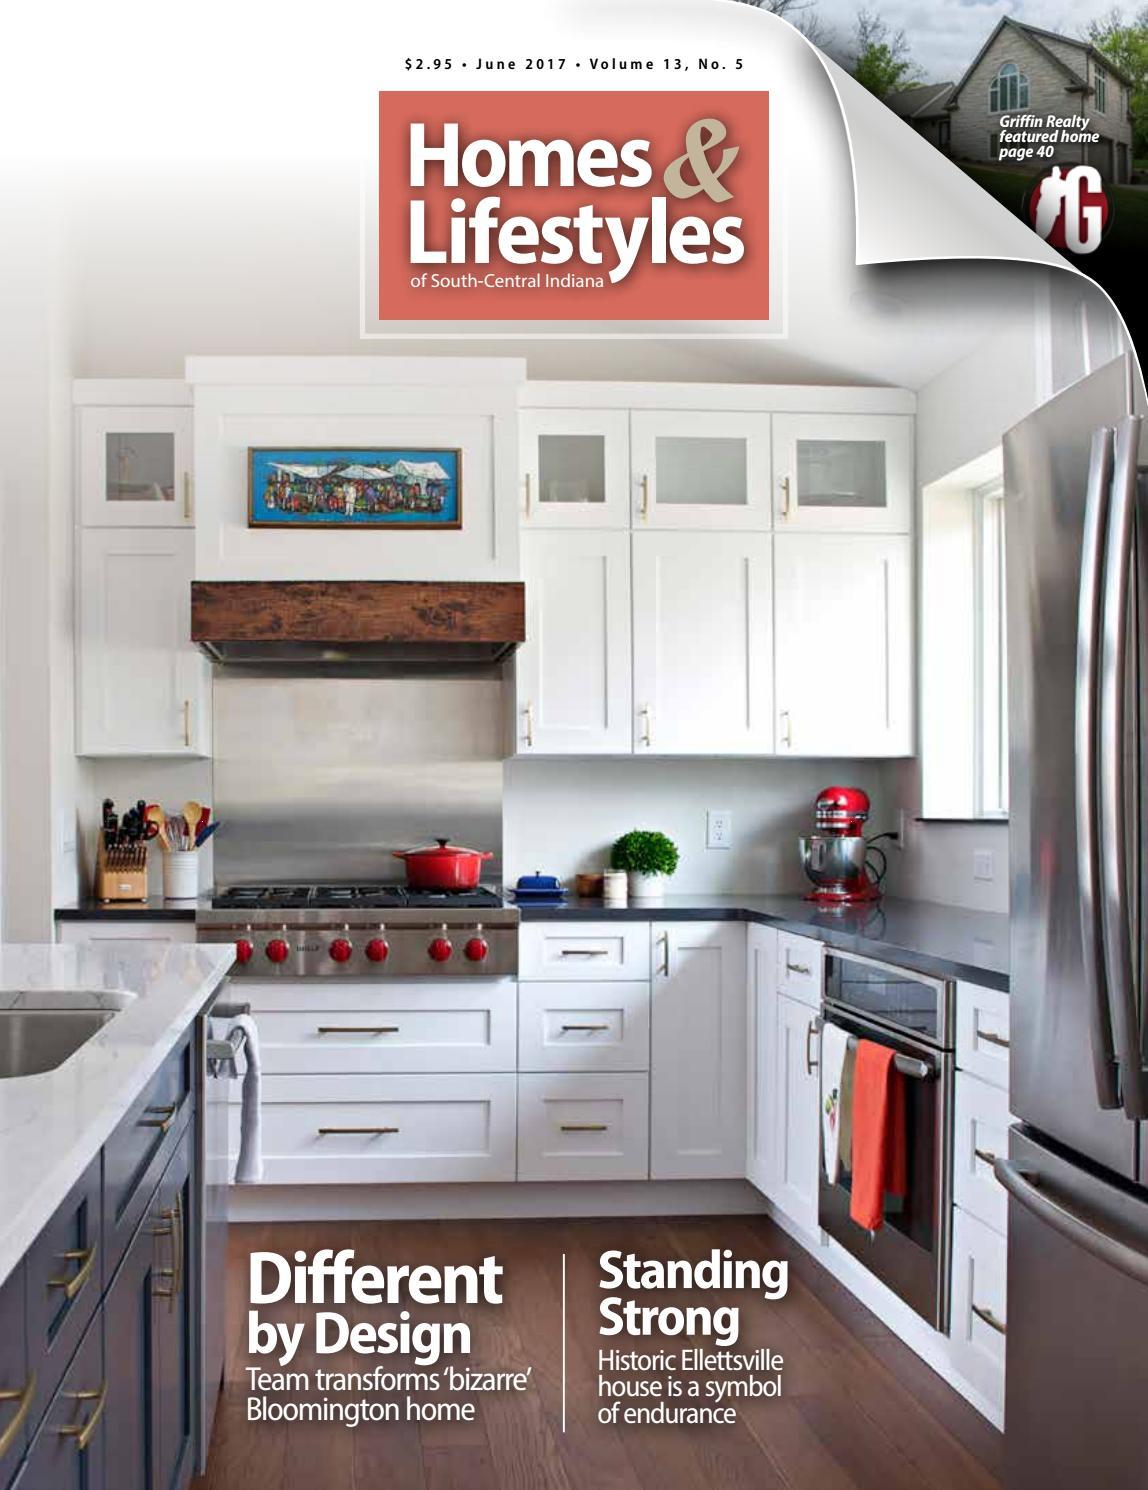 Homes & Lifestyles June 2017 by Hoosier Times Inc. - issuu